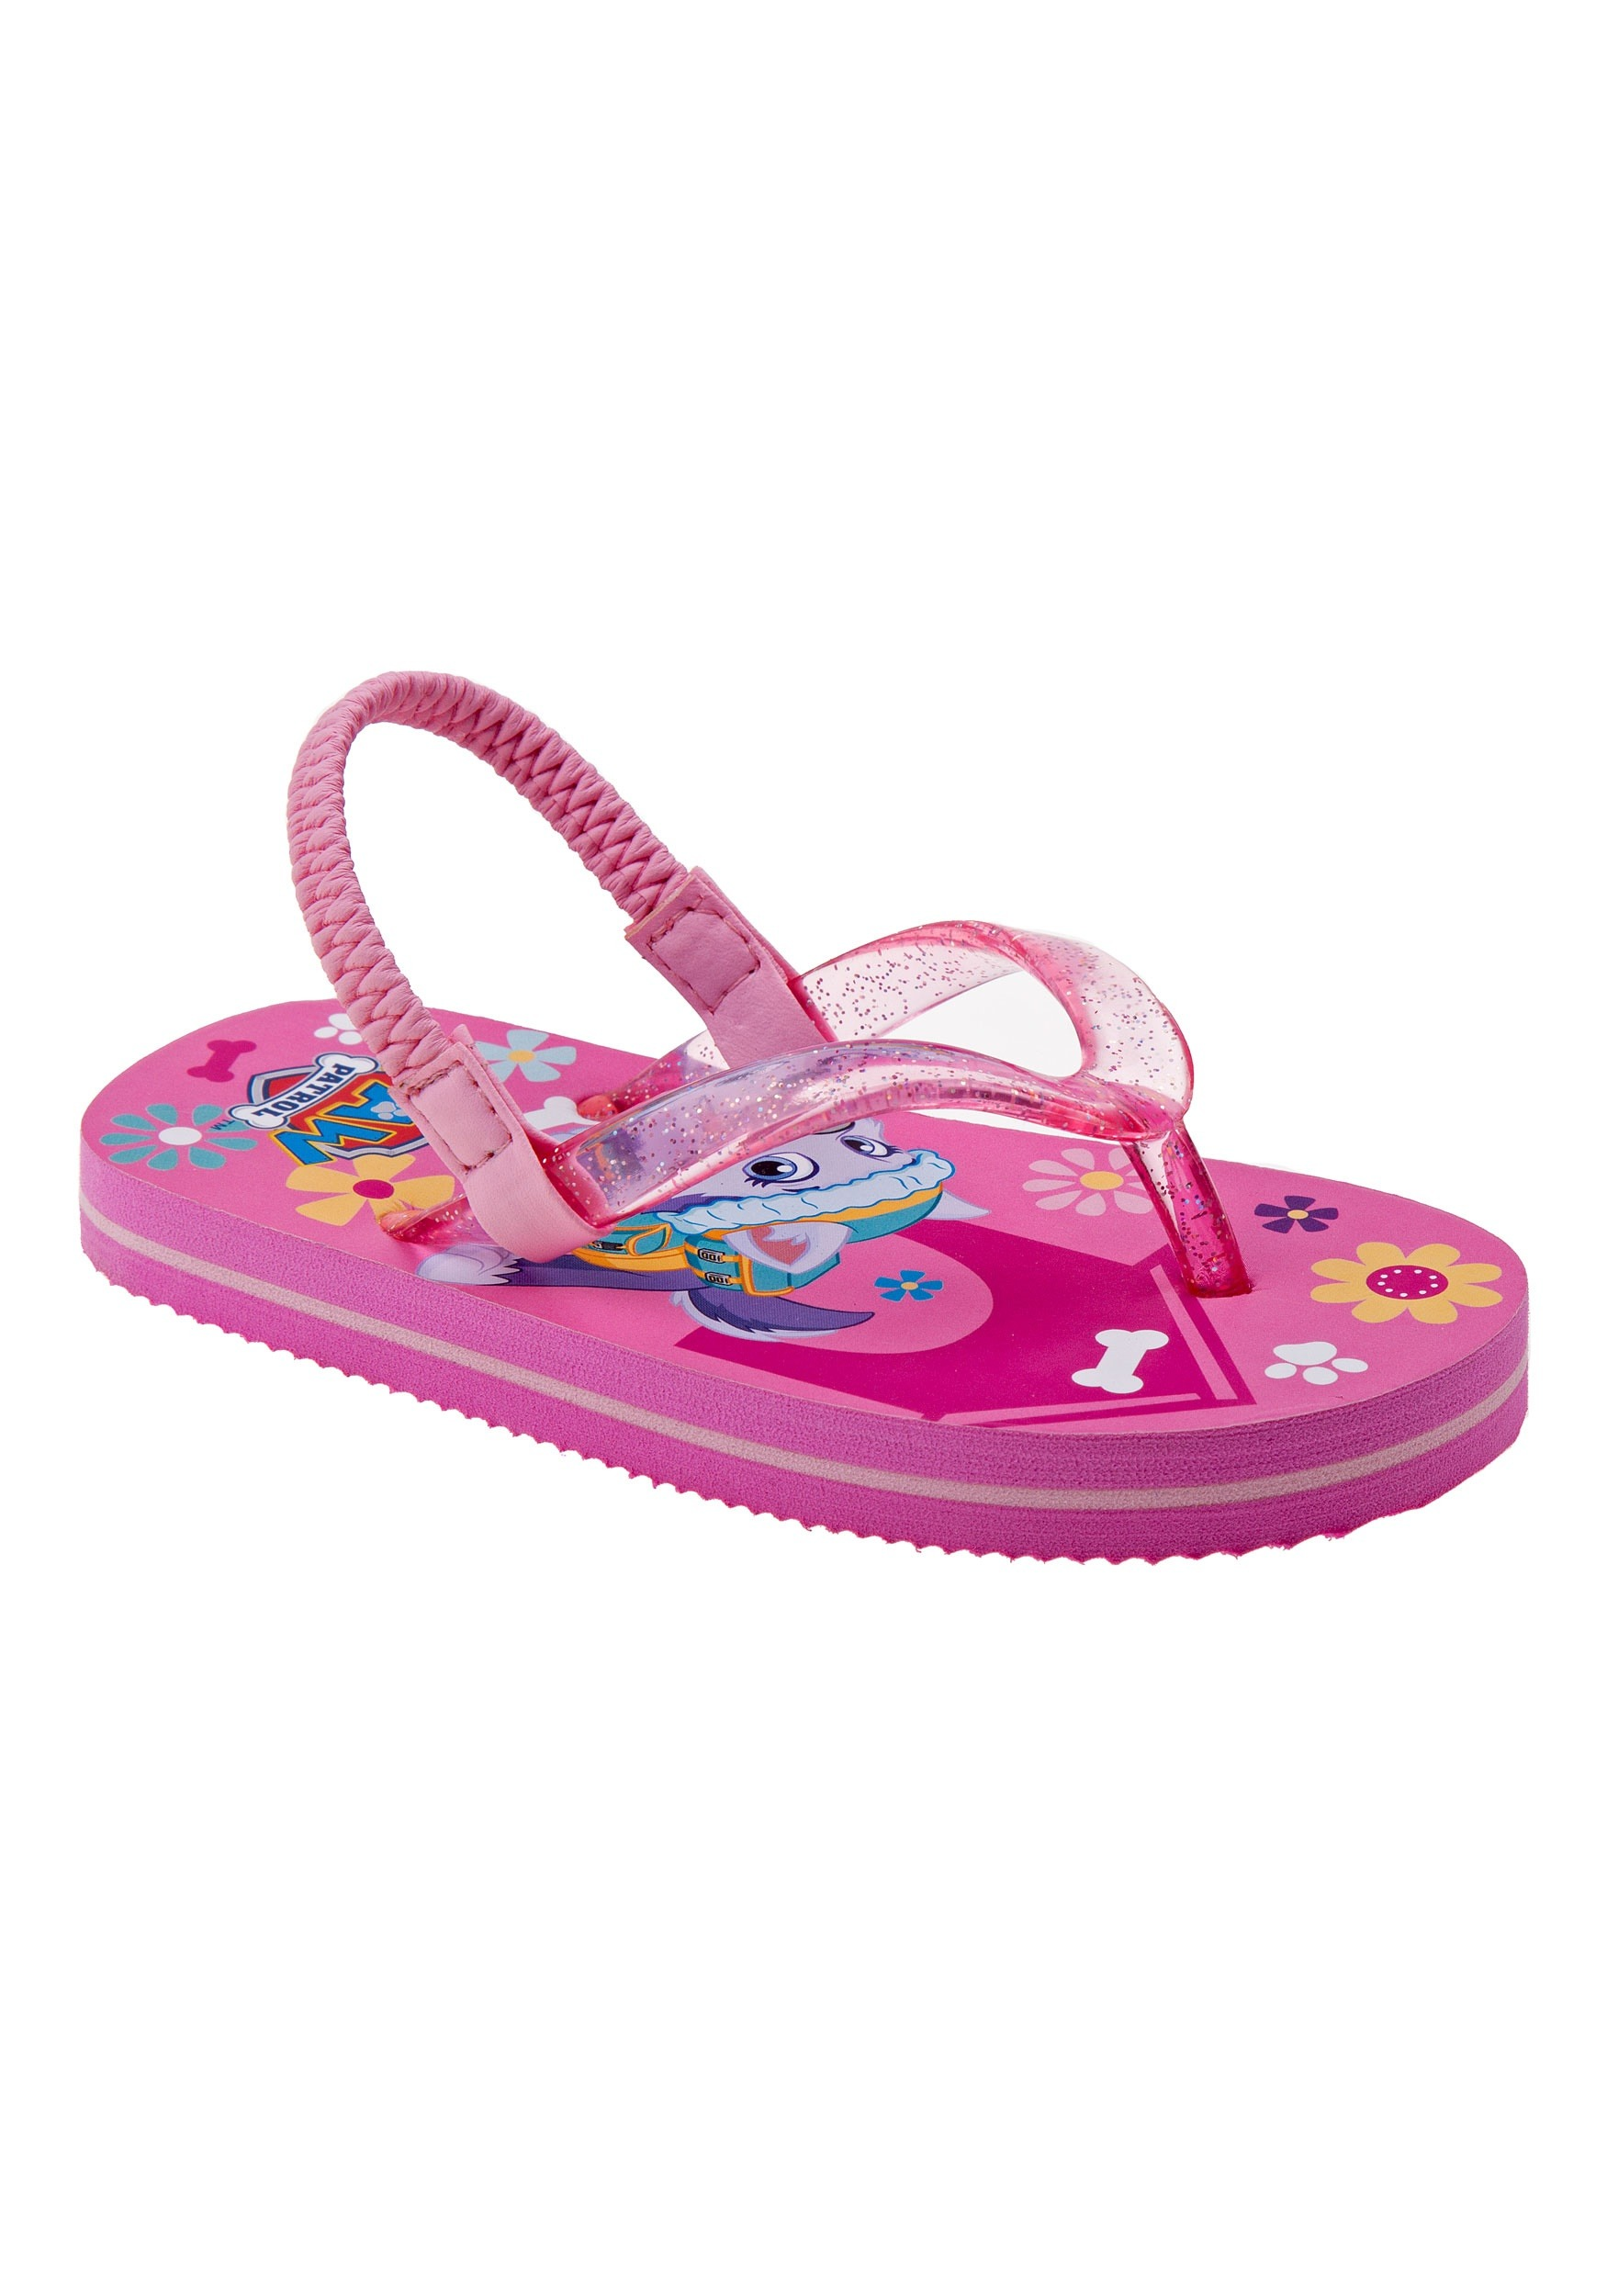 Paw Patrol Pink Girls Sandals